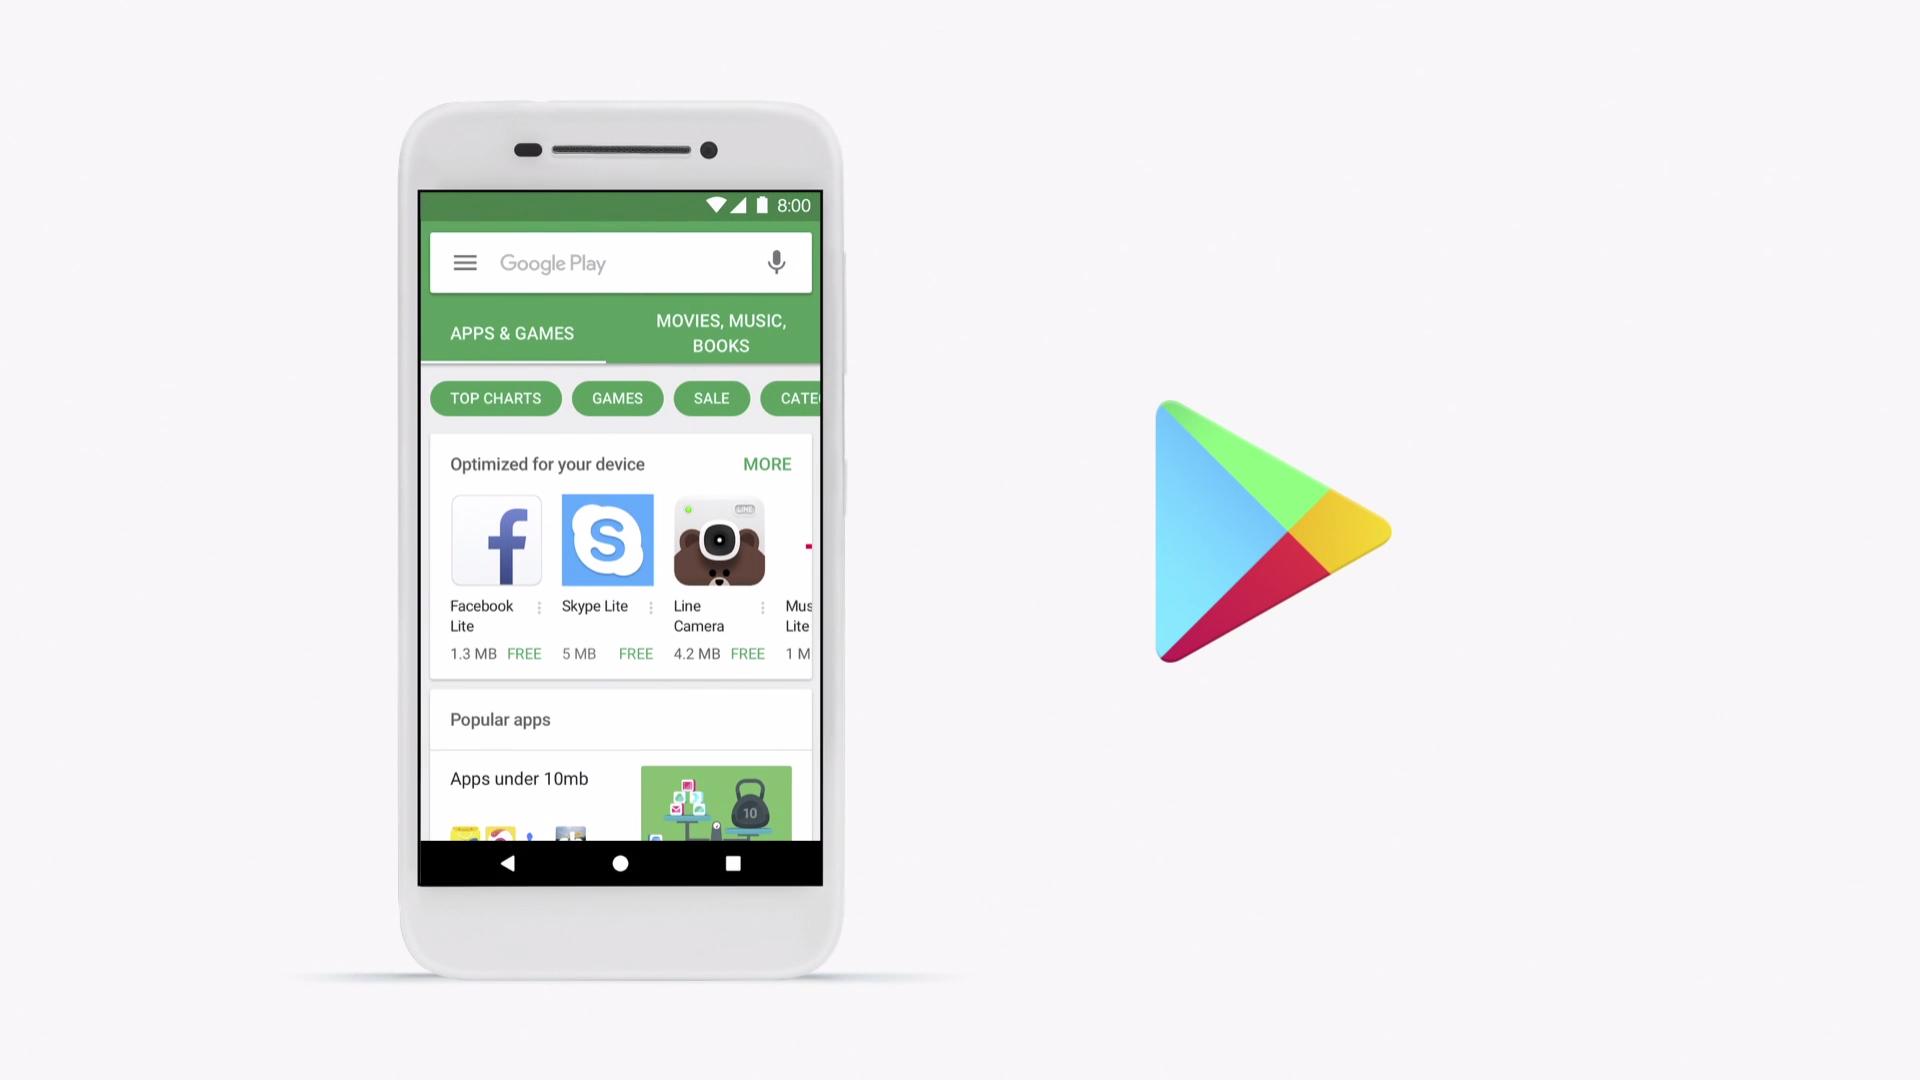 Play Store บน Android Go จะแสดงแอพเวอร์ชัน Lite ต่างๆ เพื่อการใช้งานที่ลื่นไหลในเครื่องที่สเปกต่ำ